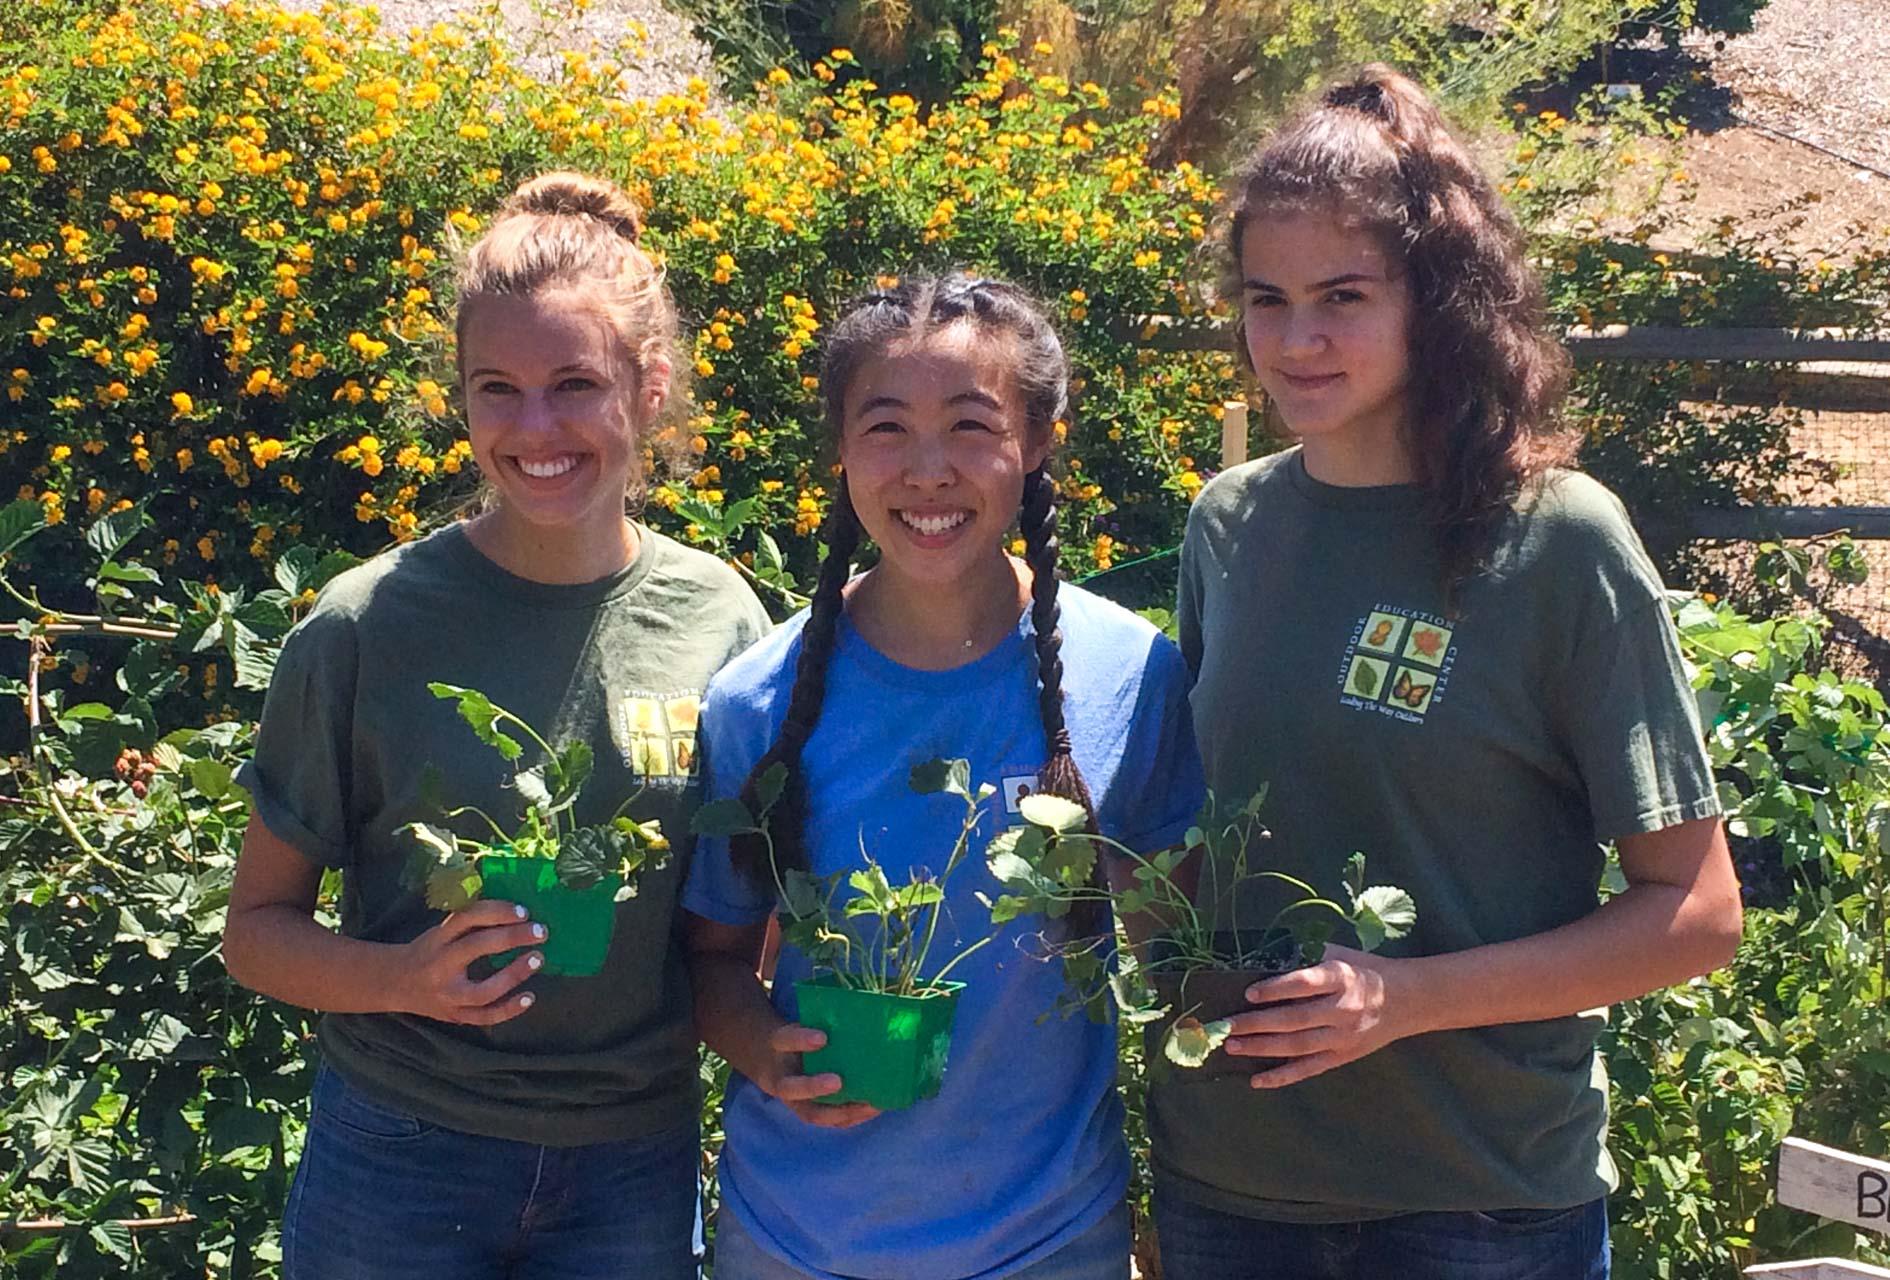 Three girls volunteering and holding flower pots